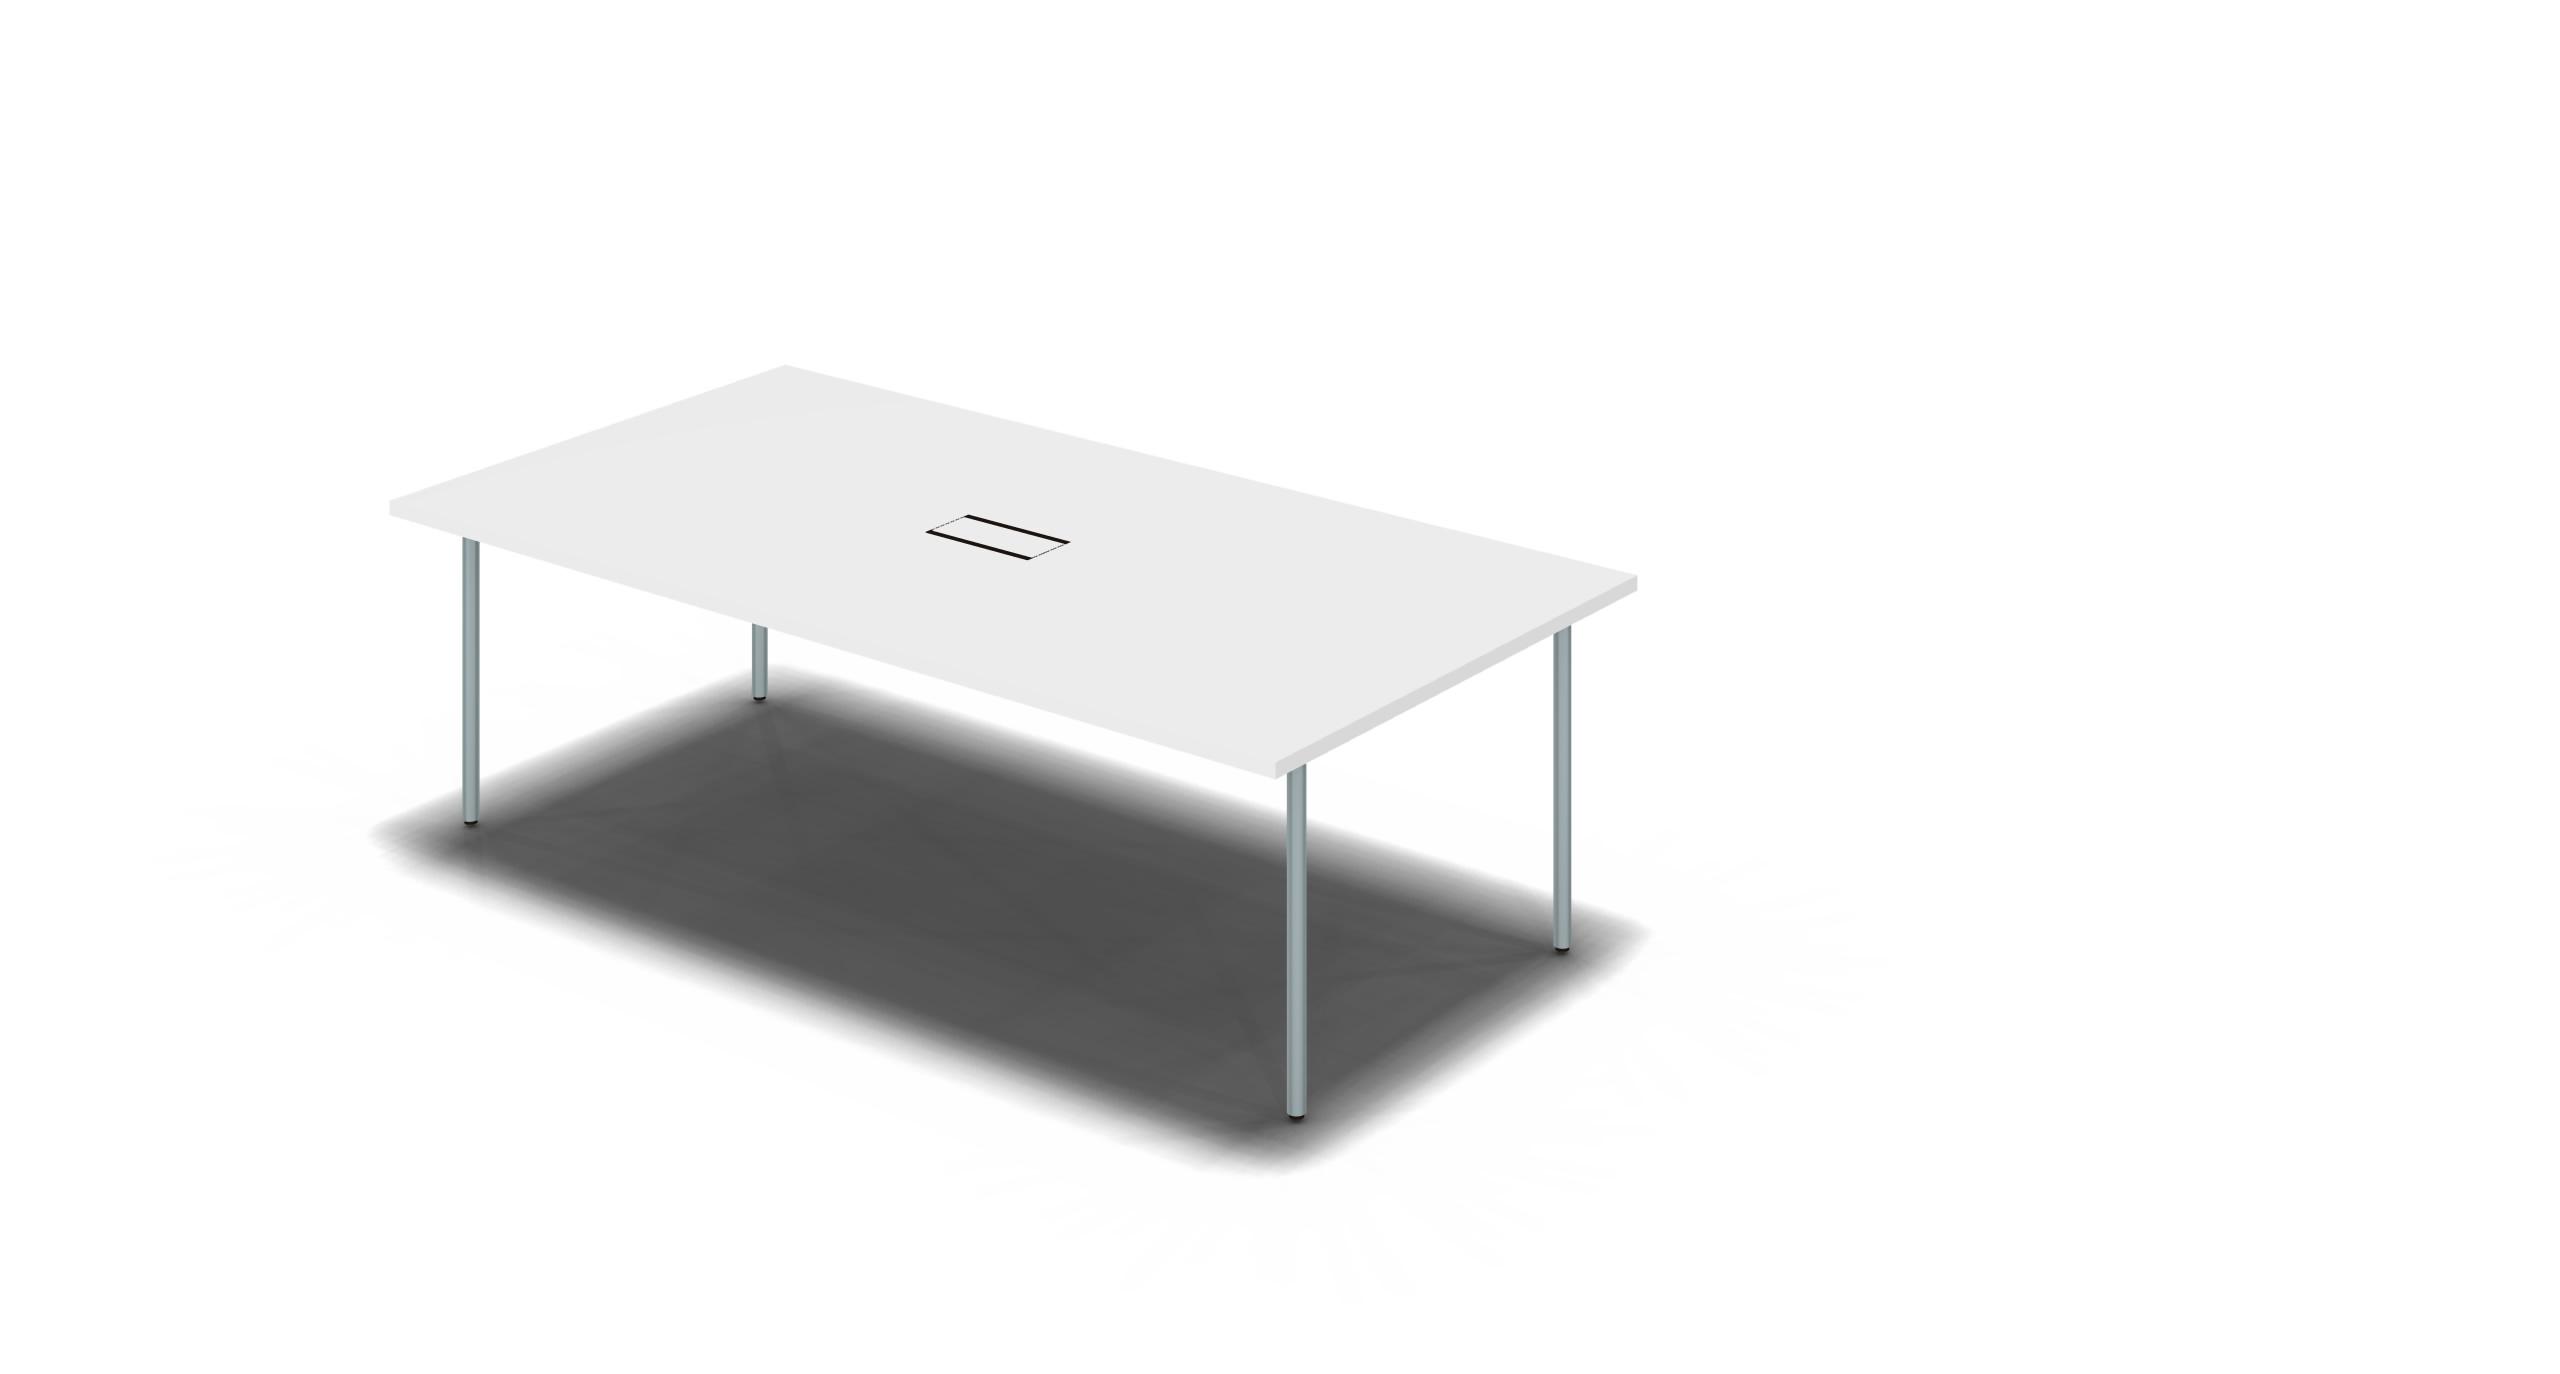 Table_Round_2100x1050_Silver_White_withOption